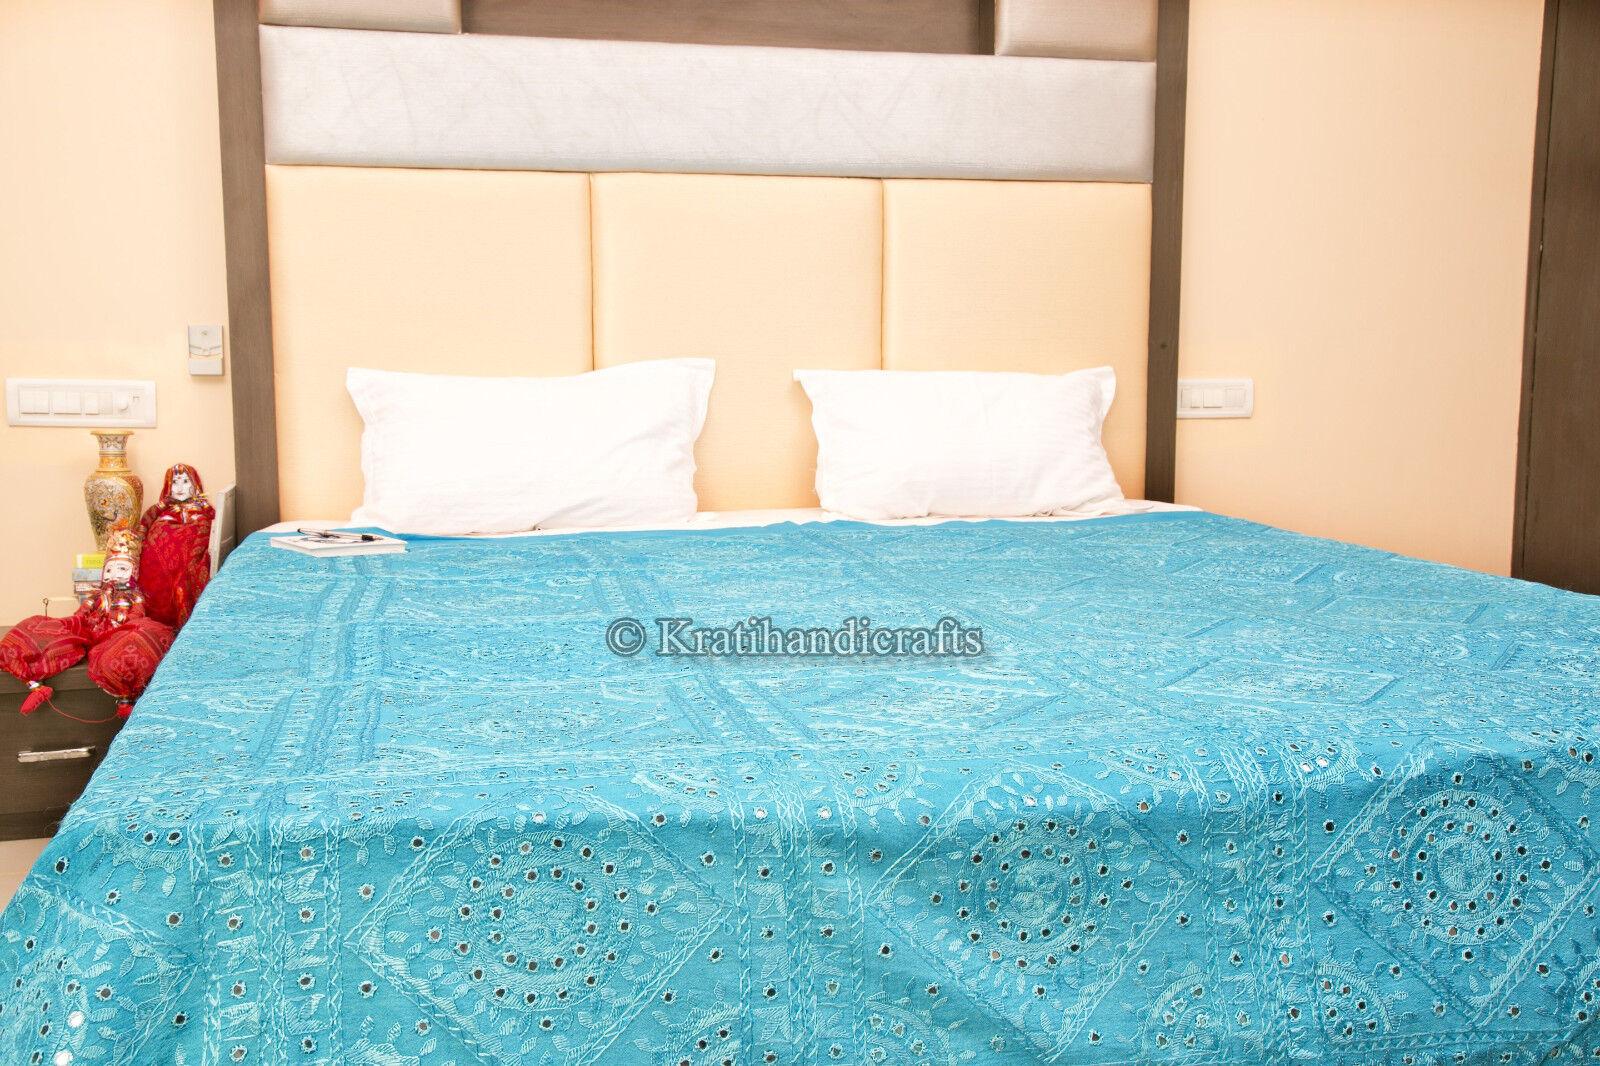 Vintage Royal decor Hand Embroidered Bed Cover Ethnic Blanket Decorative Bedding